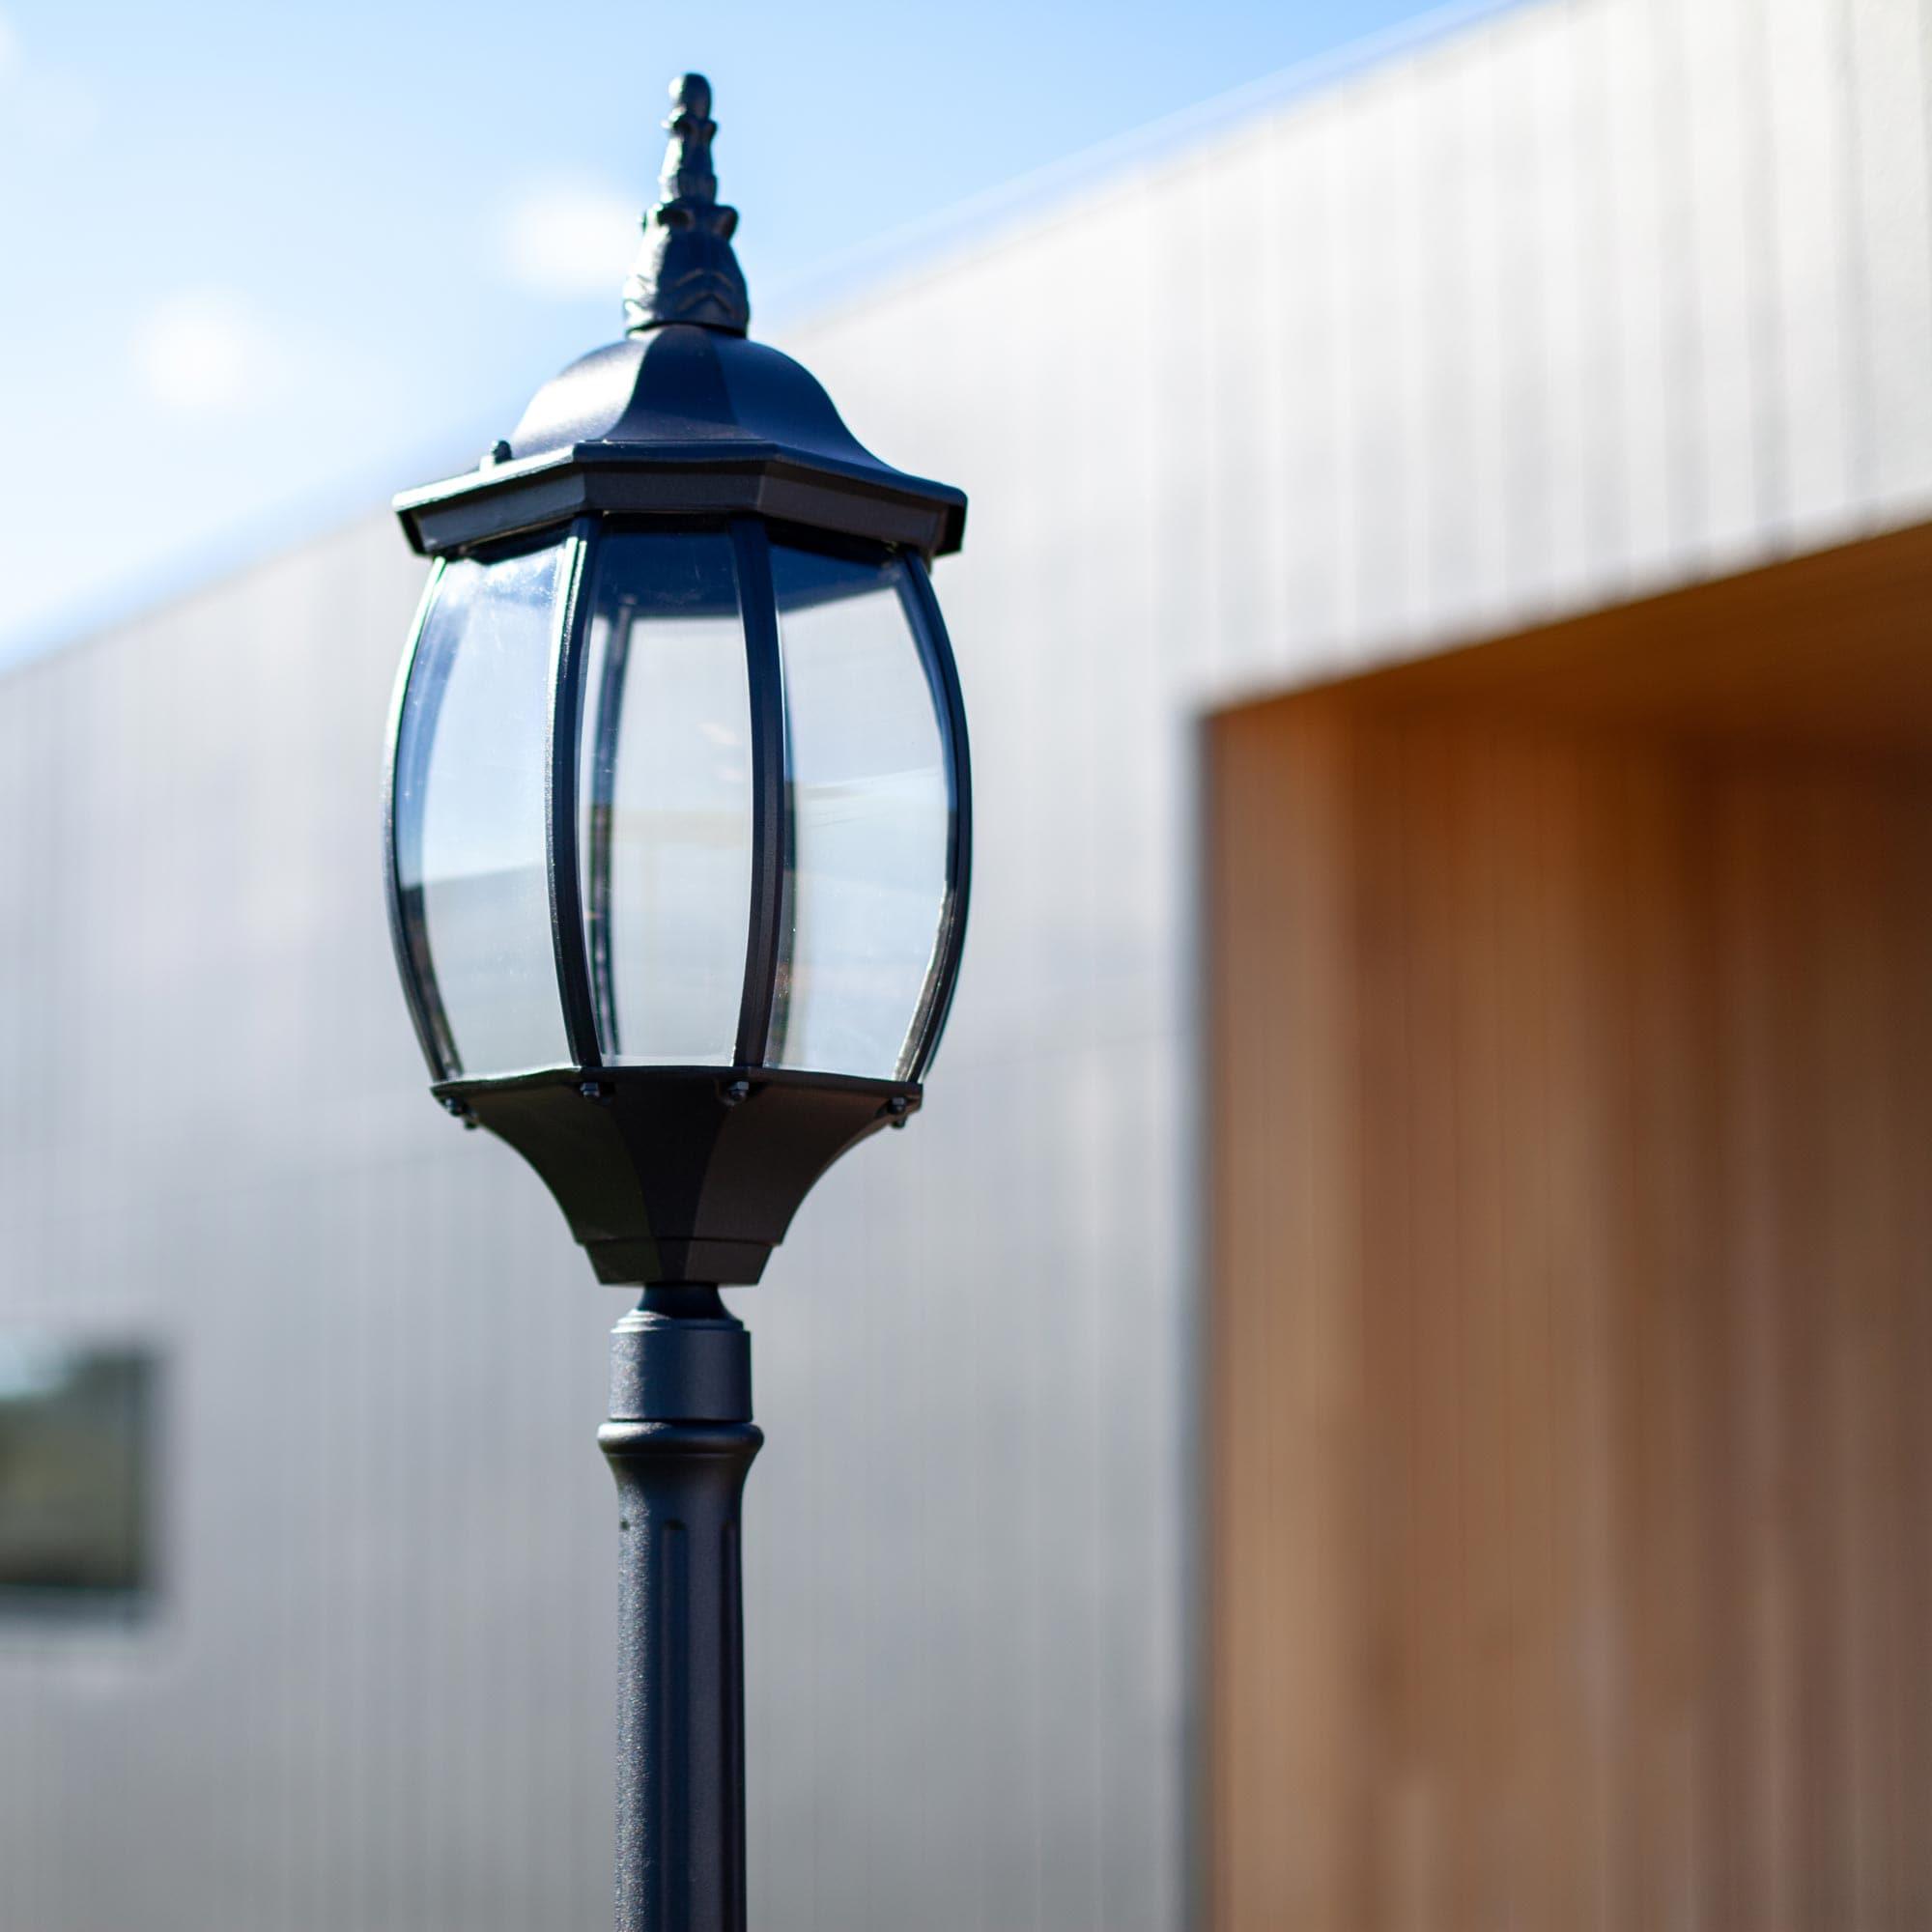 3 Pcs Street View Street Lamp Post Building Block Glow Component Decoration